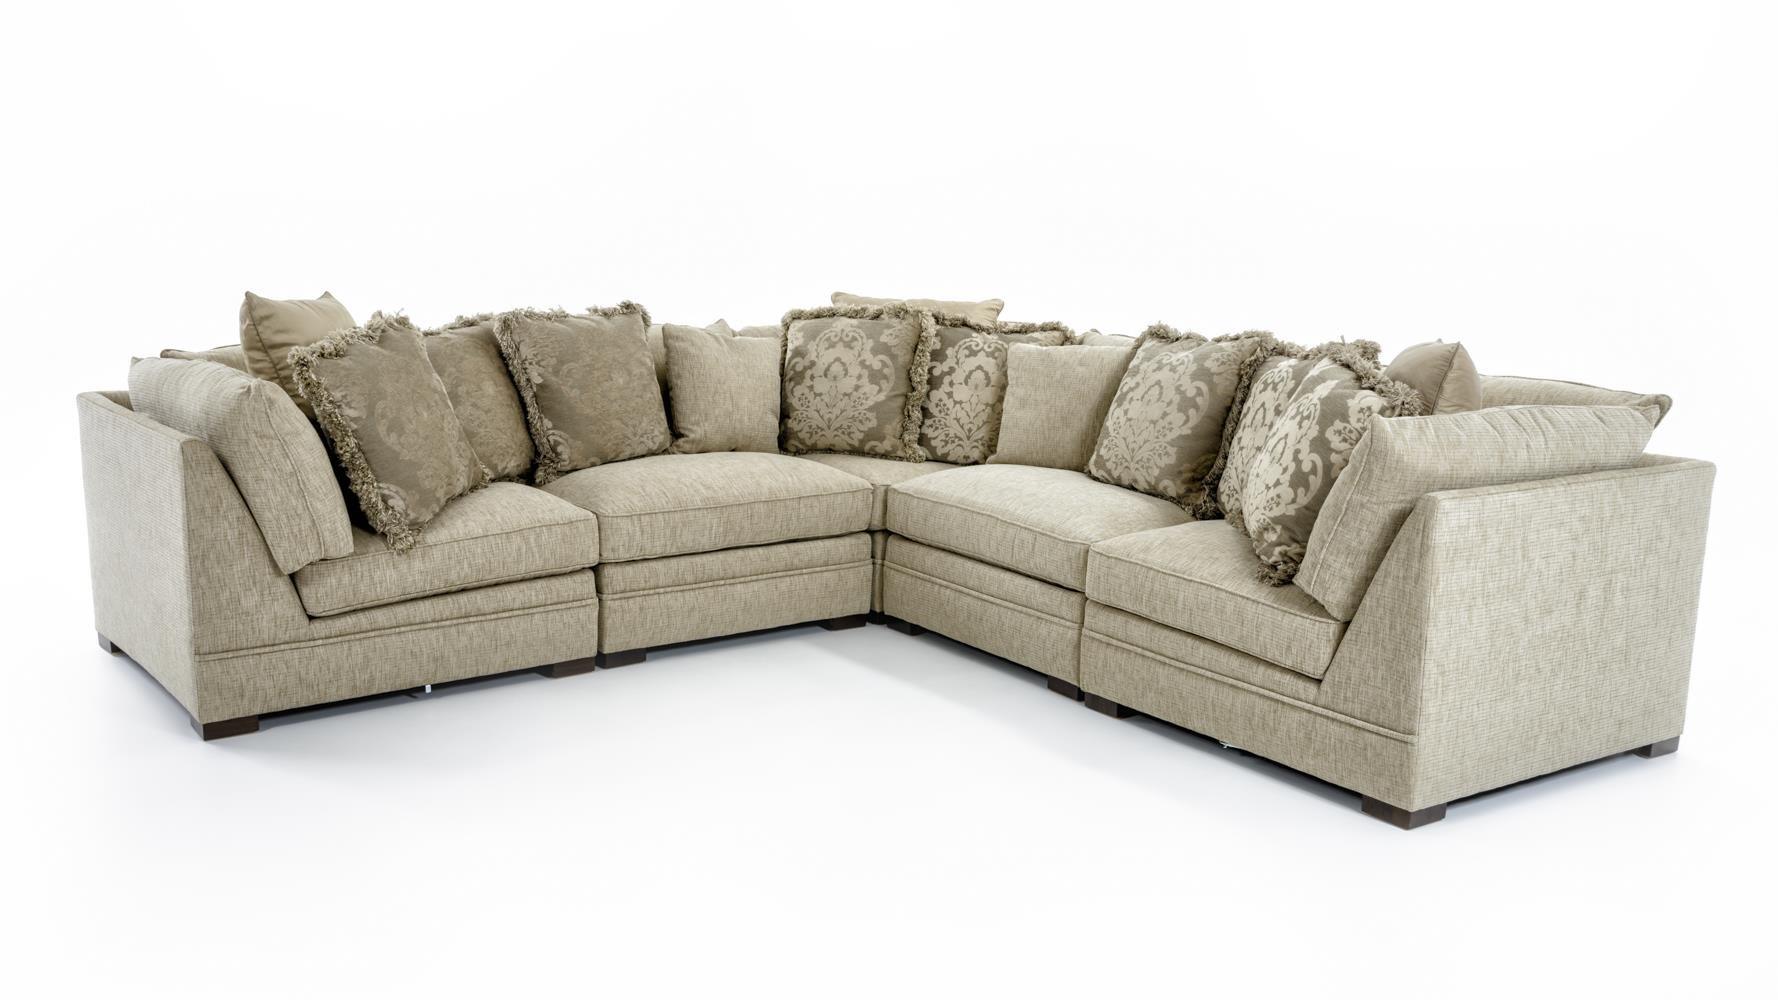 Huntington House 71005 Piece Corner Sectional Sofa ...